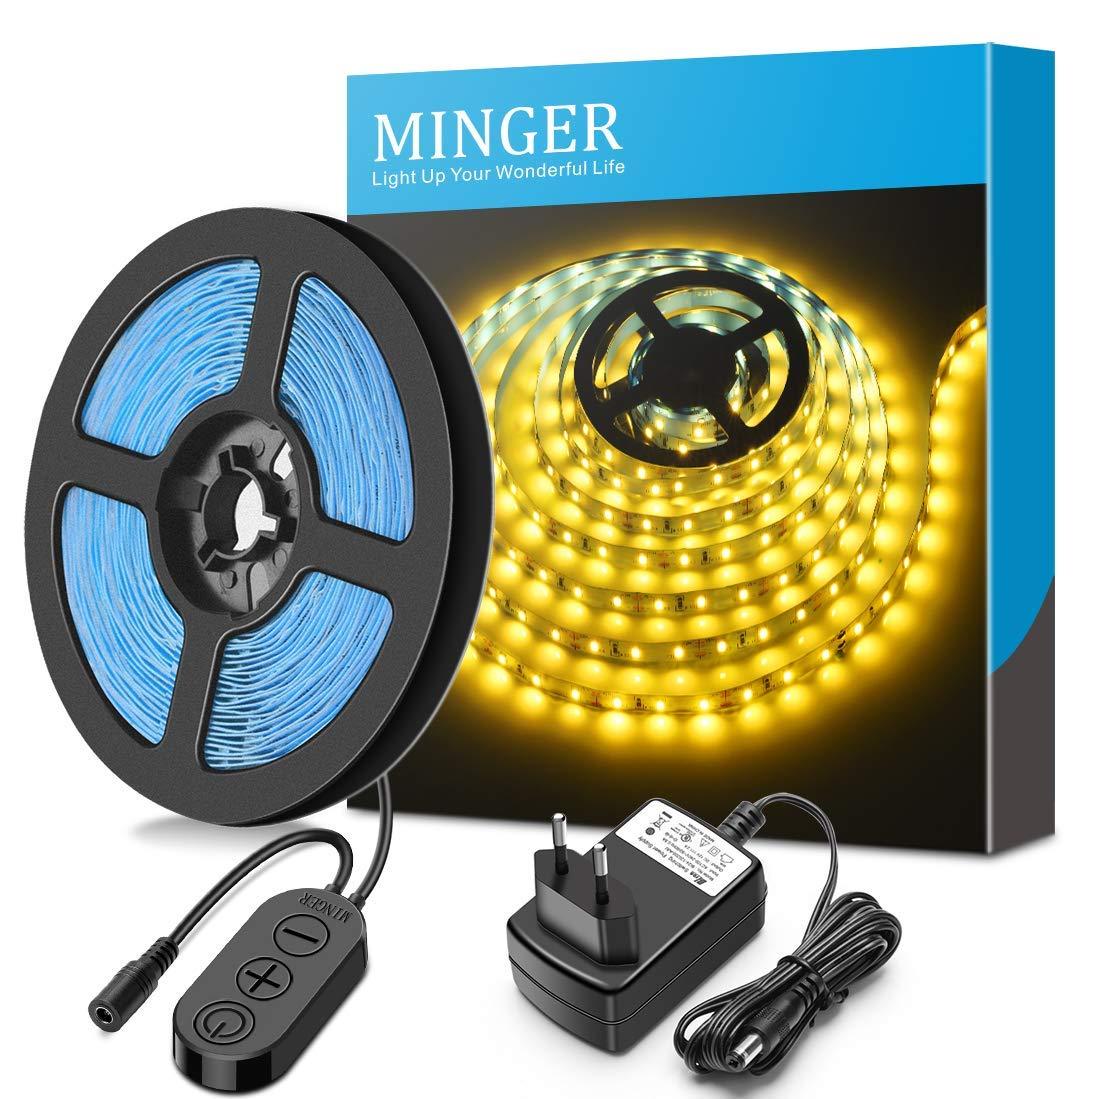 Minger 5m Dimmbar LED Strip, LED Streifen Kit, 3500K warmweiße